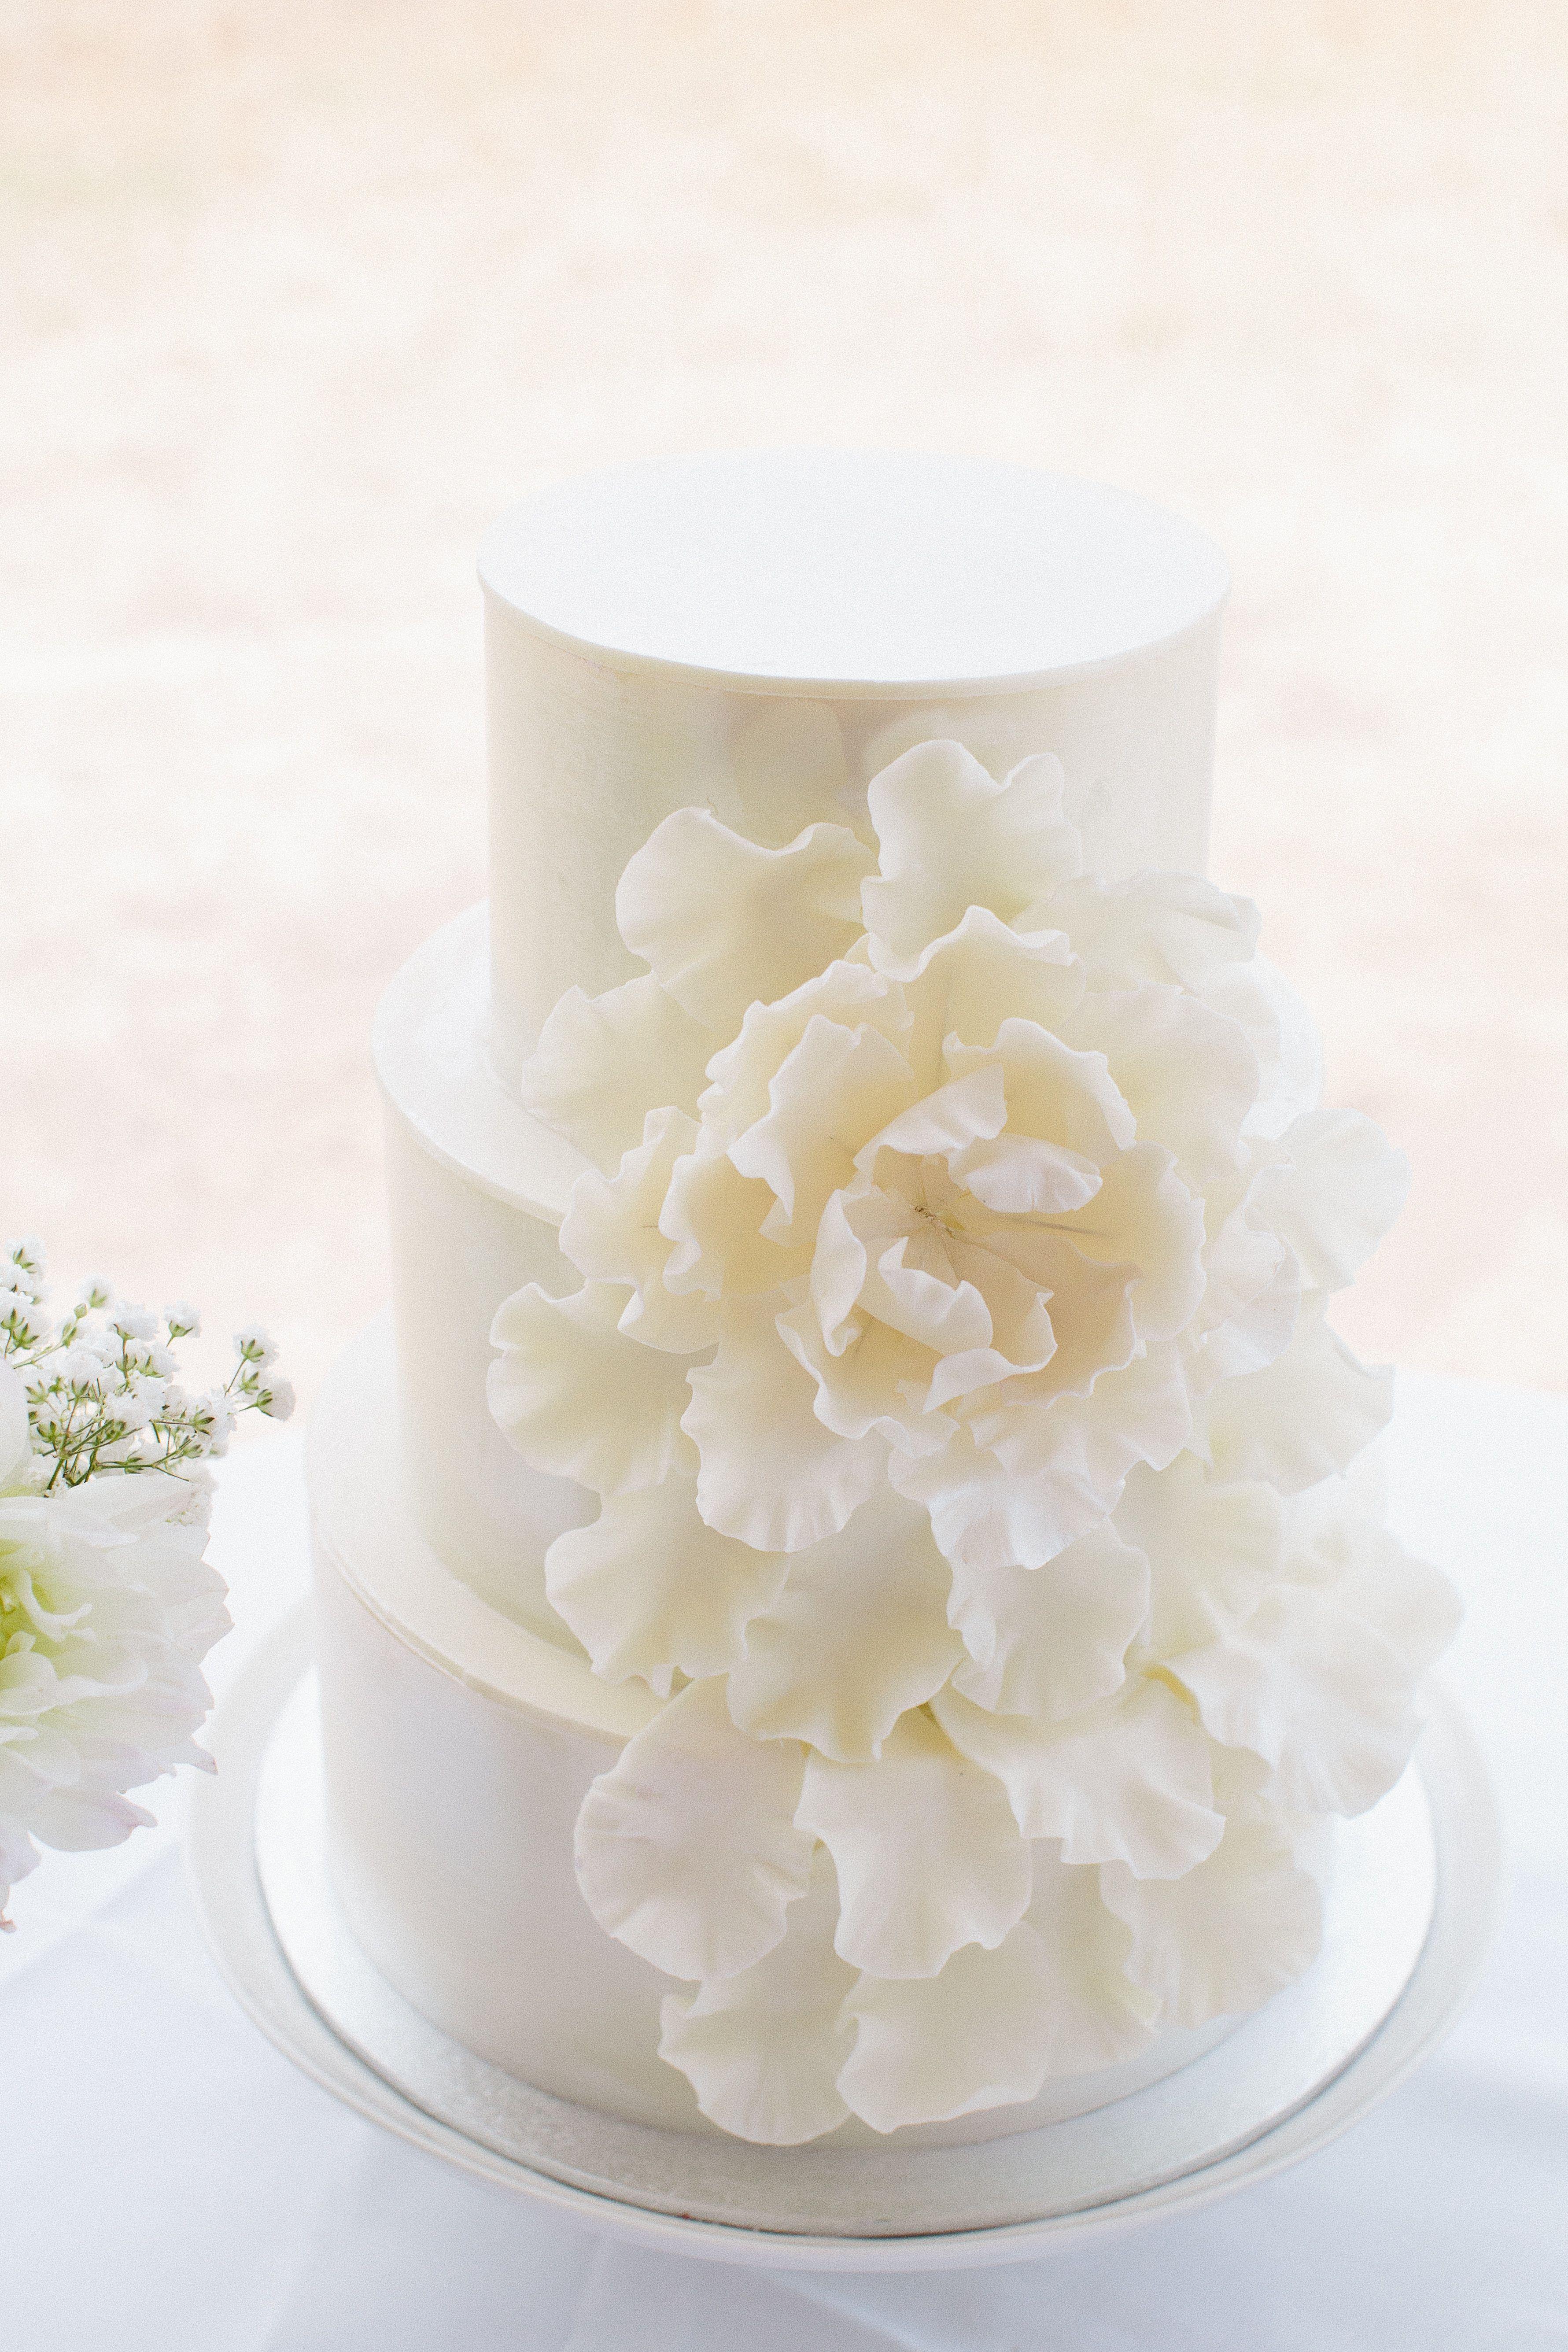 White chocolate wedding cake - White chocolate wedding cake ...